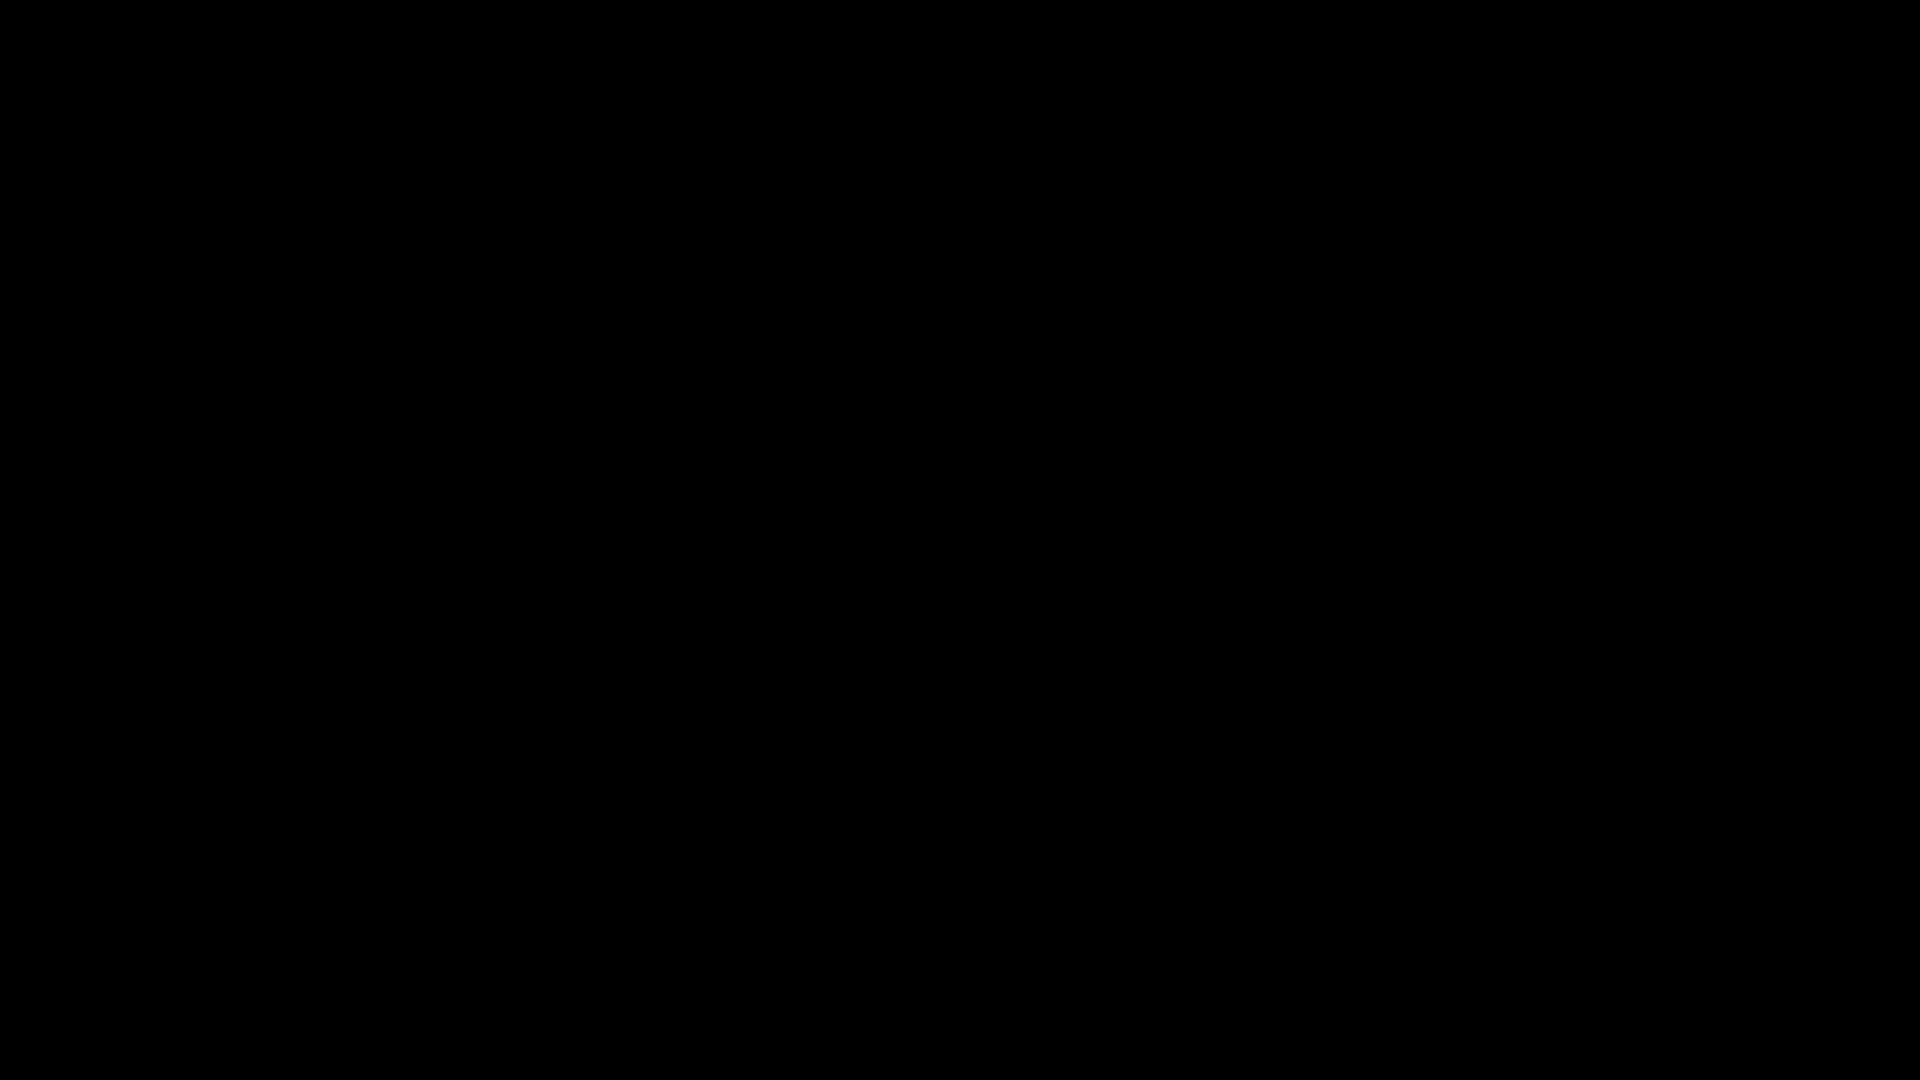 summonerswar, Oracle GIFs